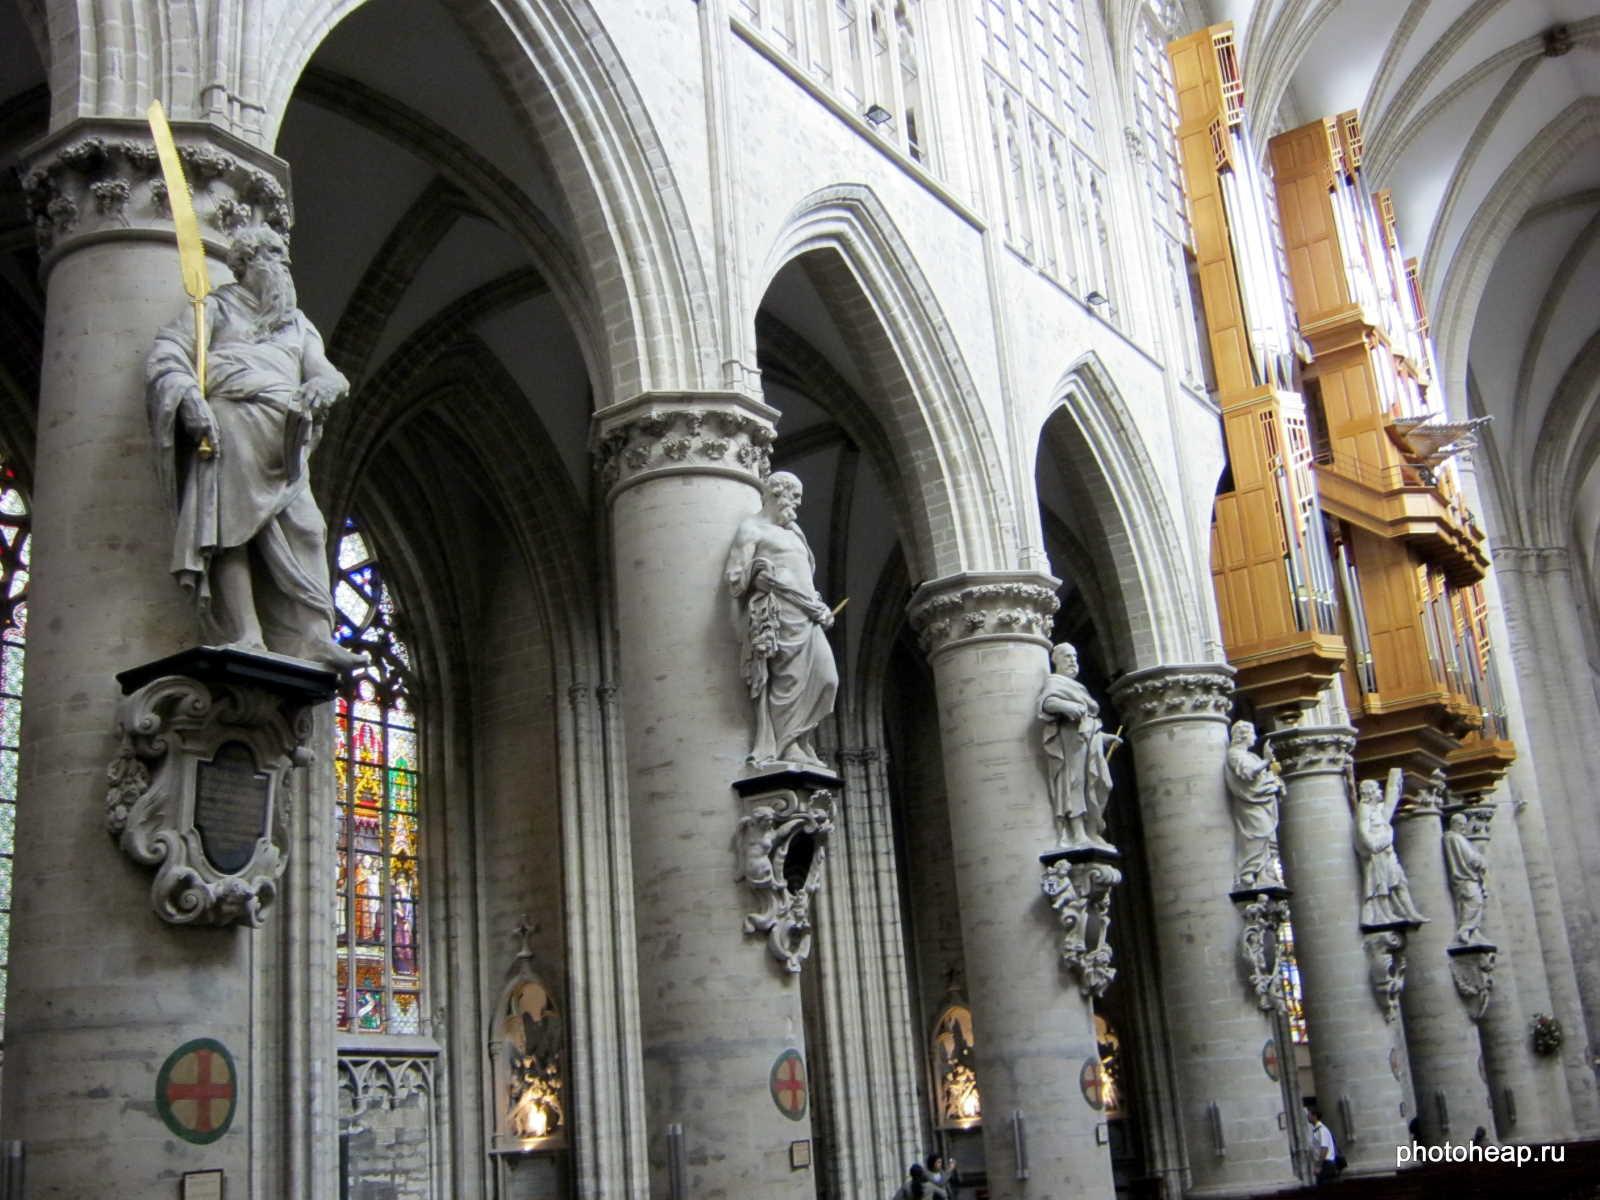 Brussels - church statues